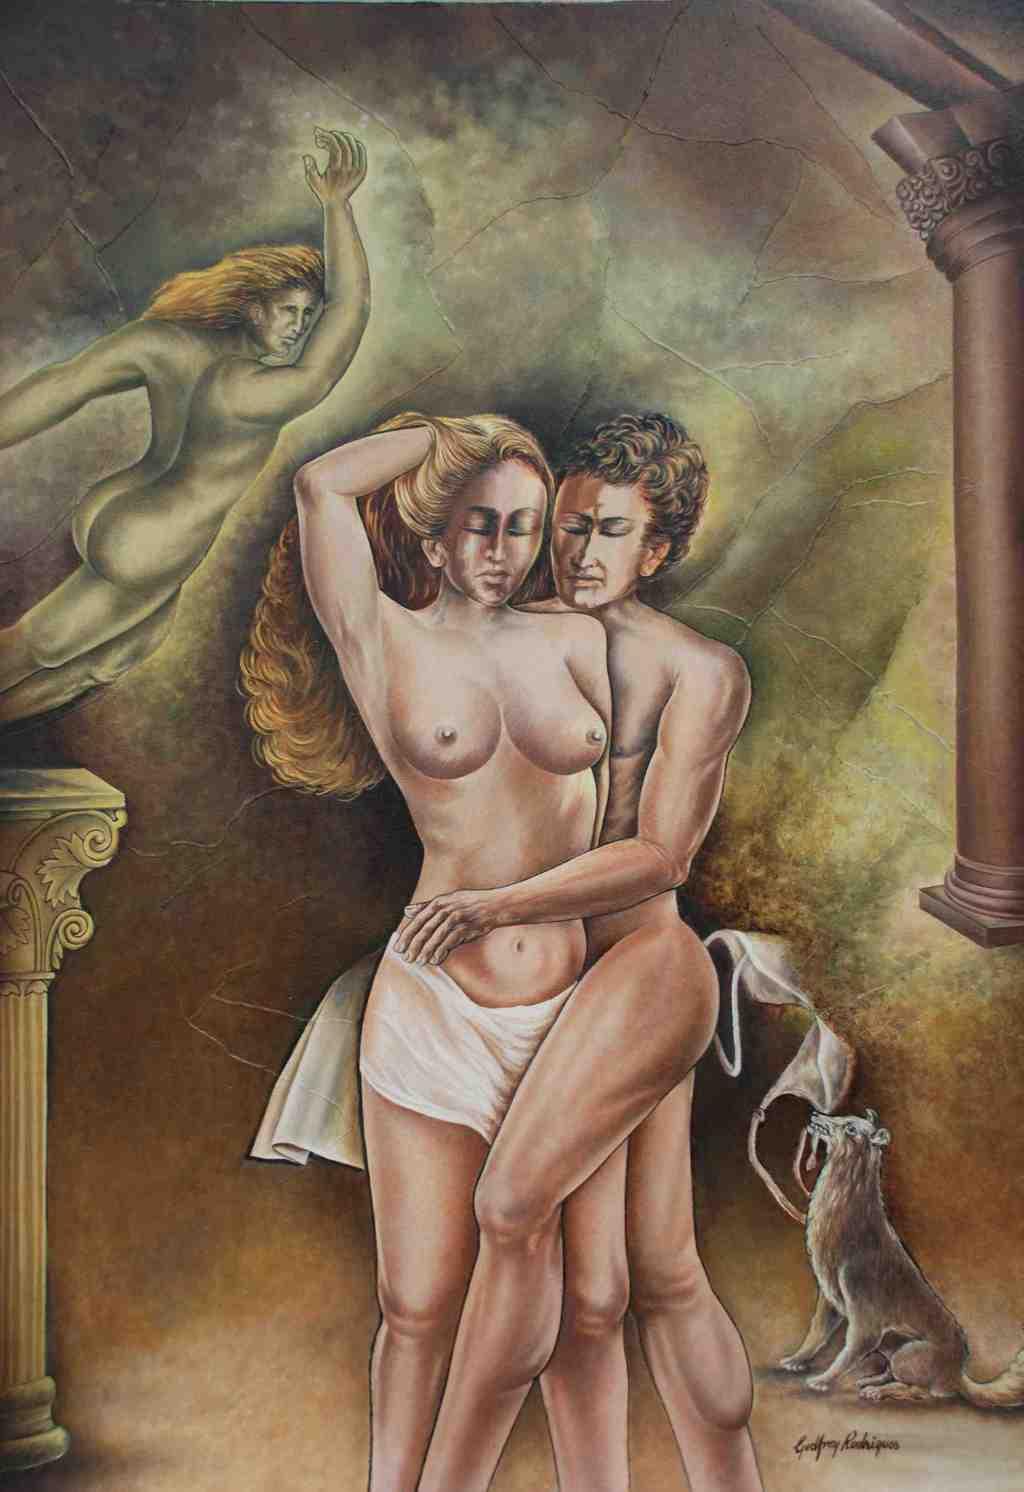 Oil massage interracial lovers